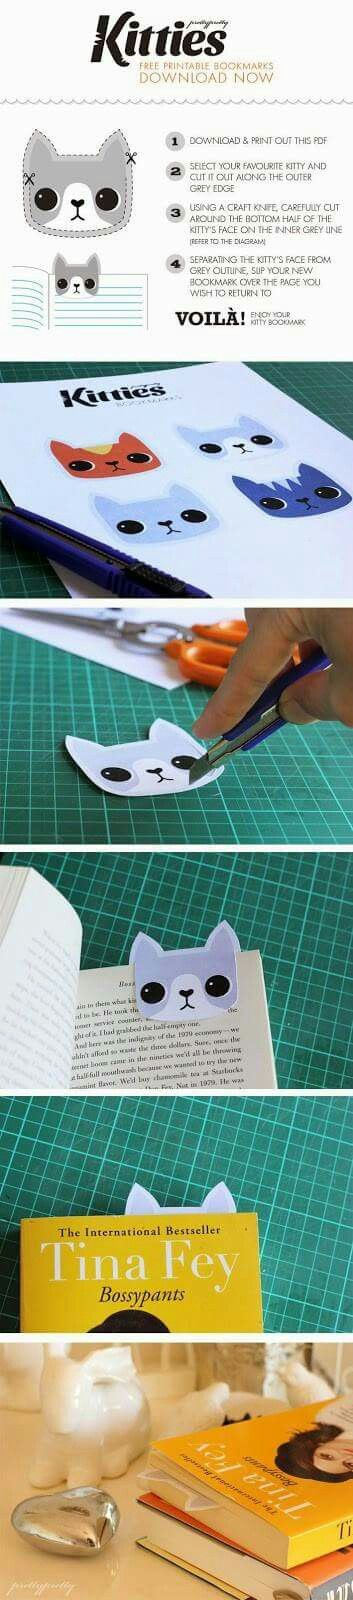 Diy idea how to make tutorial kitty